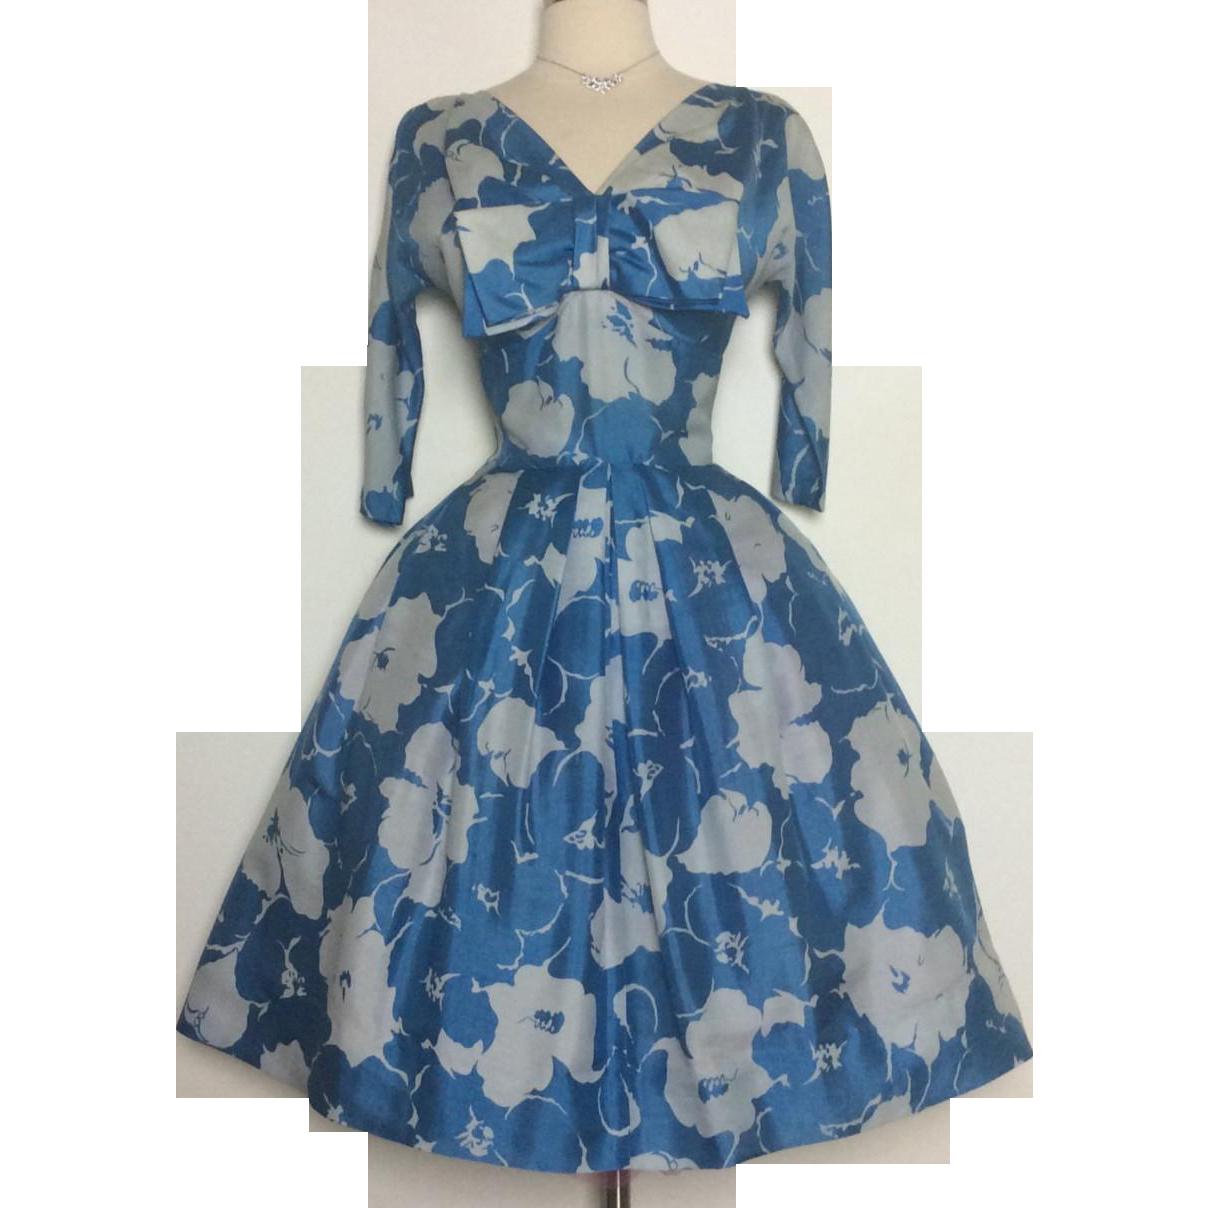 Vintage s dress suzy perette s dress new look femme